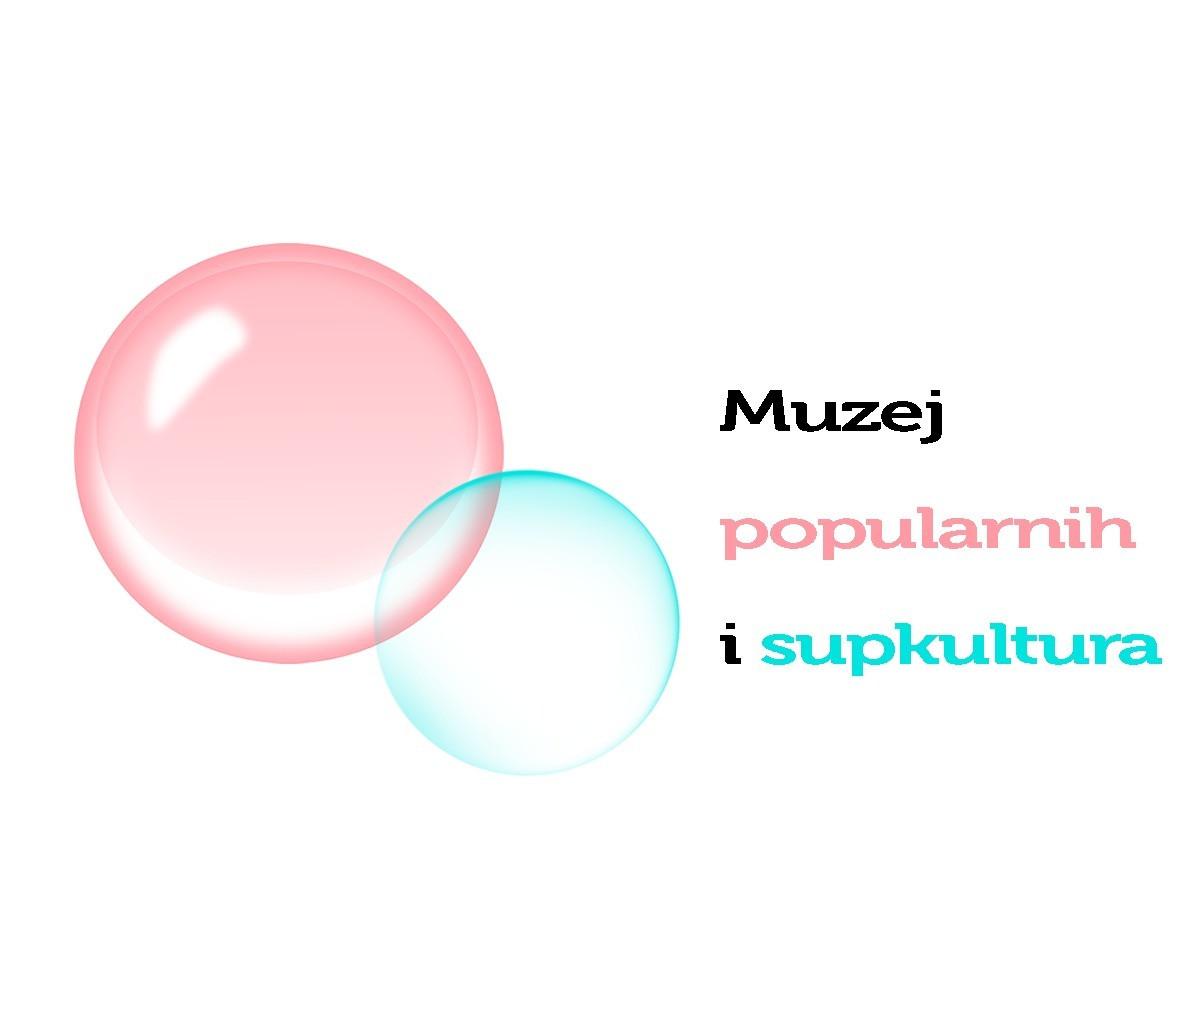 Kreativnost je suprotnost rutini: Muzej popularnih i supkultura